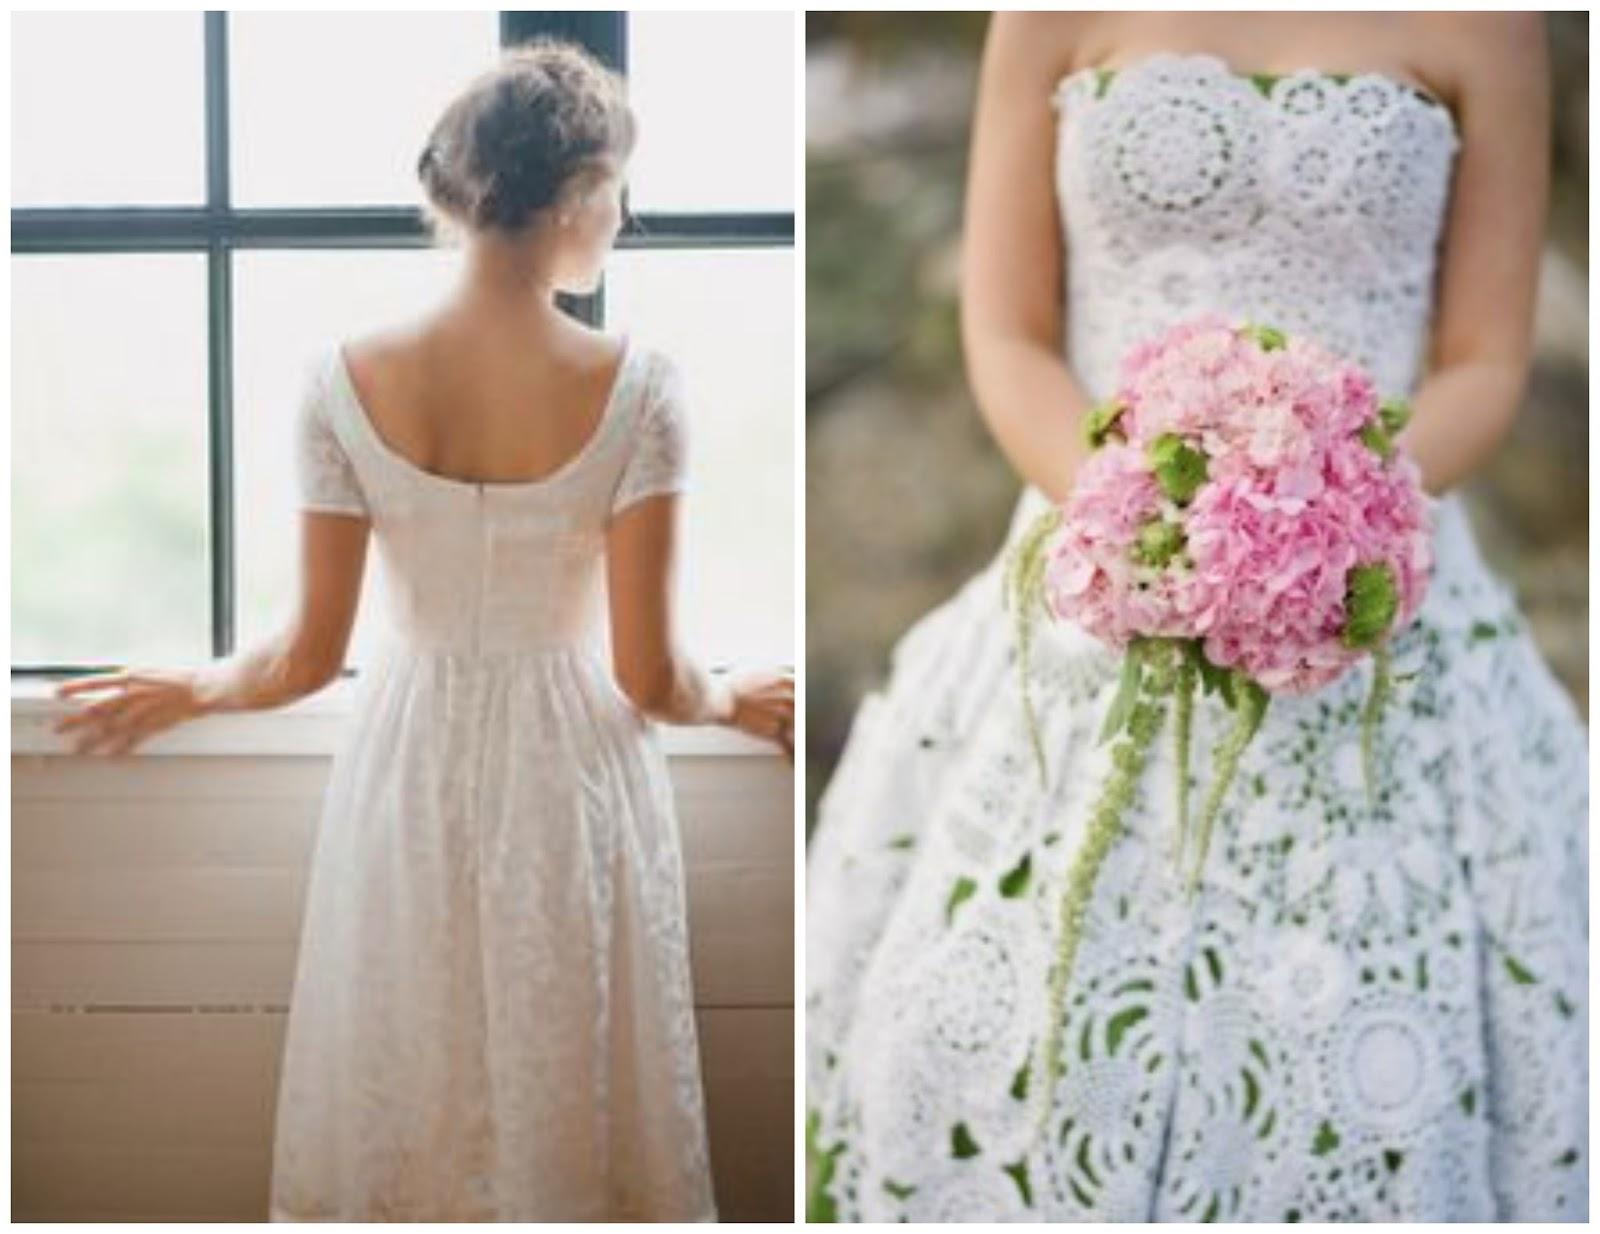 handmade wedding dresses photo - 1